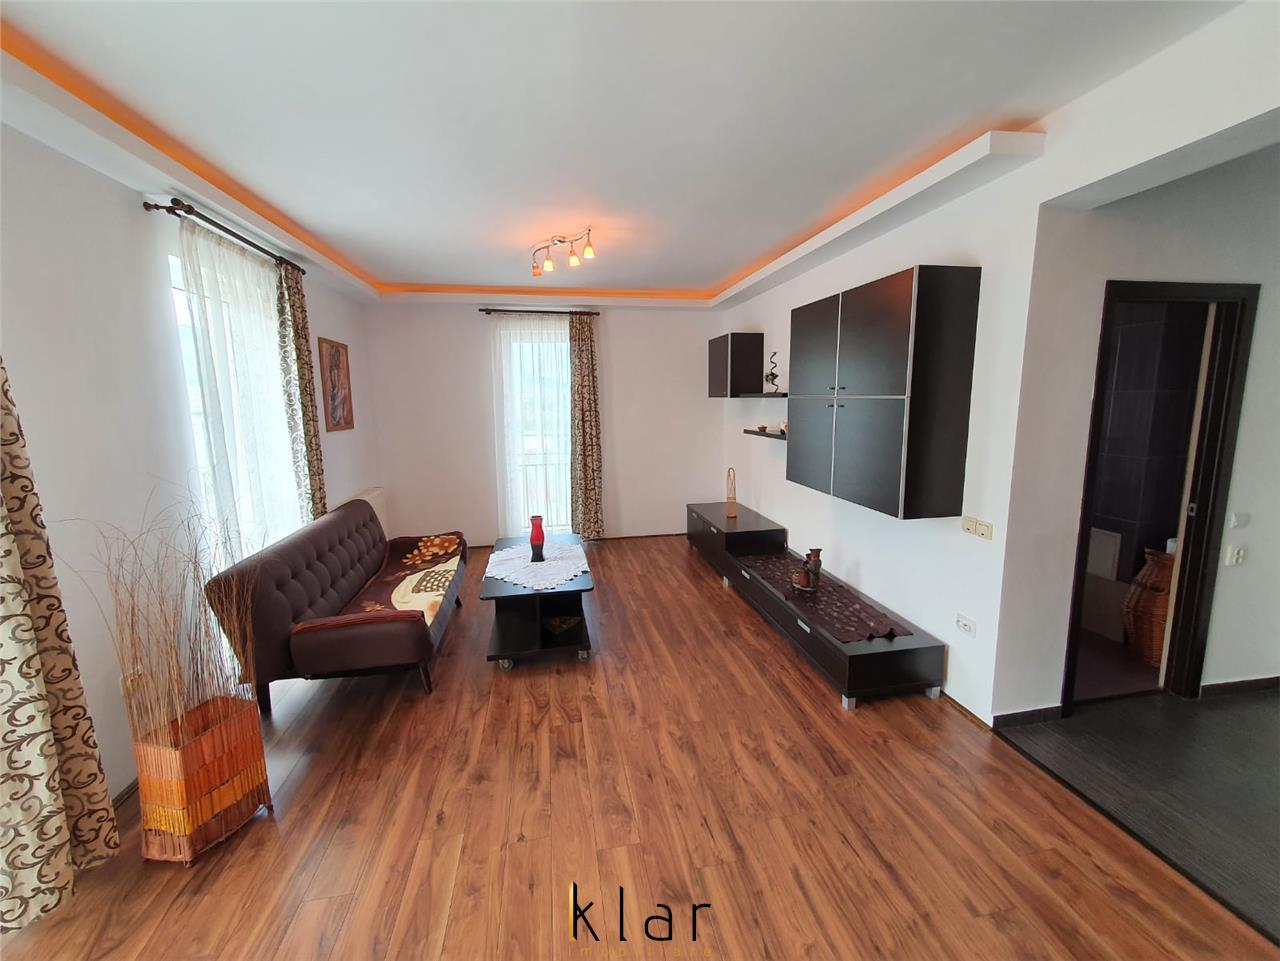 Apartament de vanzare 2 camere+o terasa de 14 mp,zona Porii!